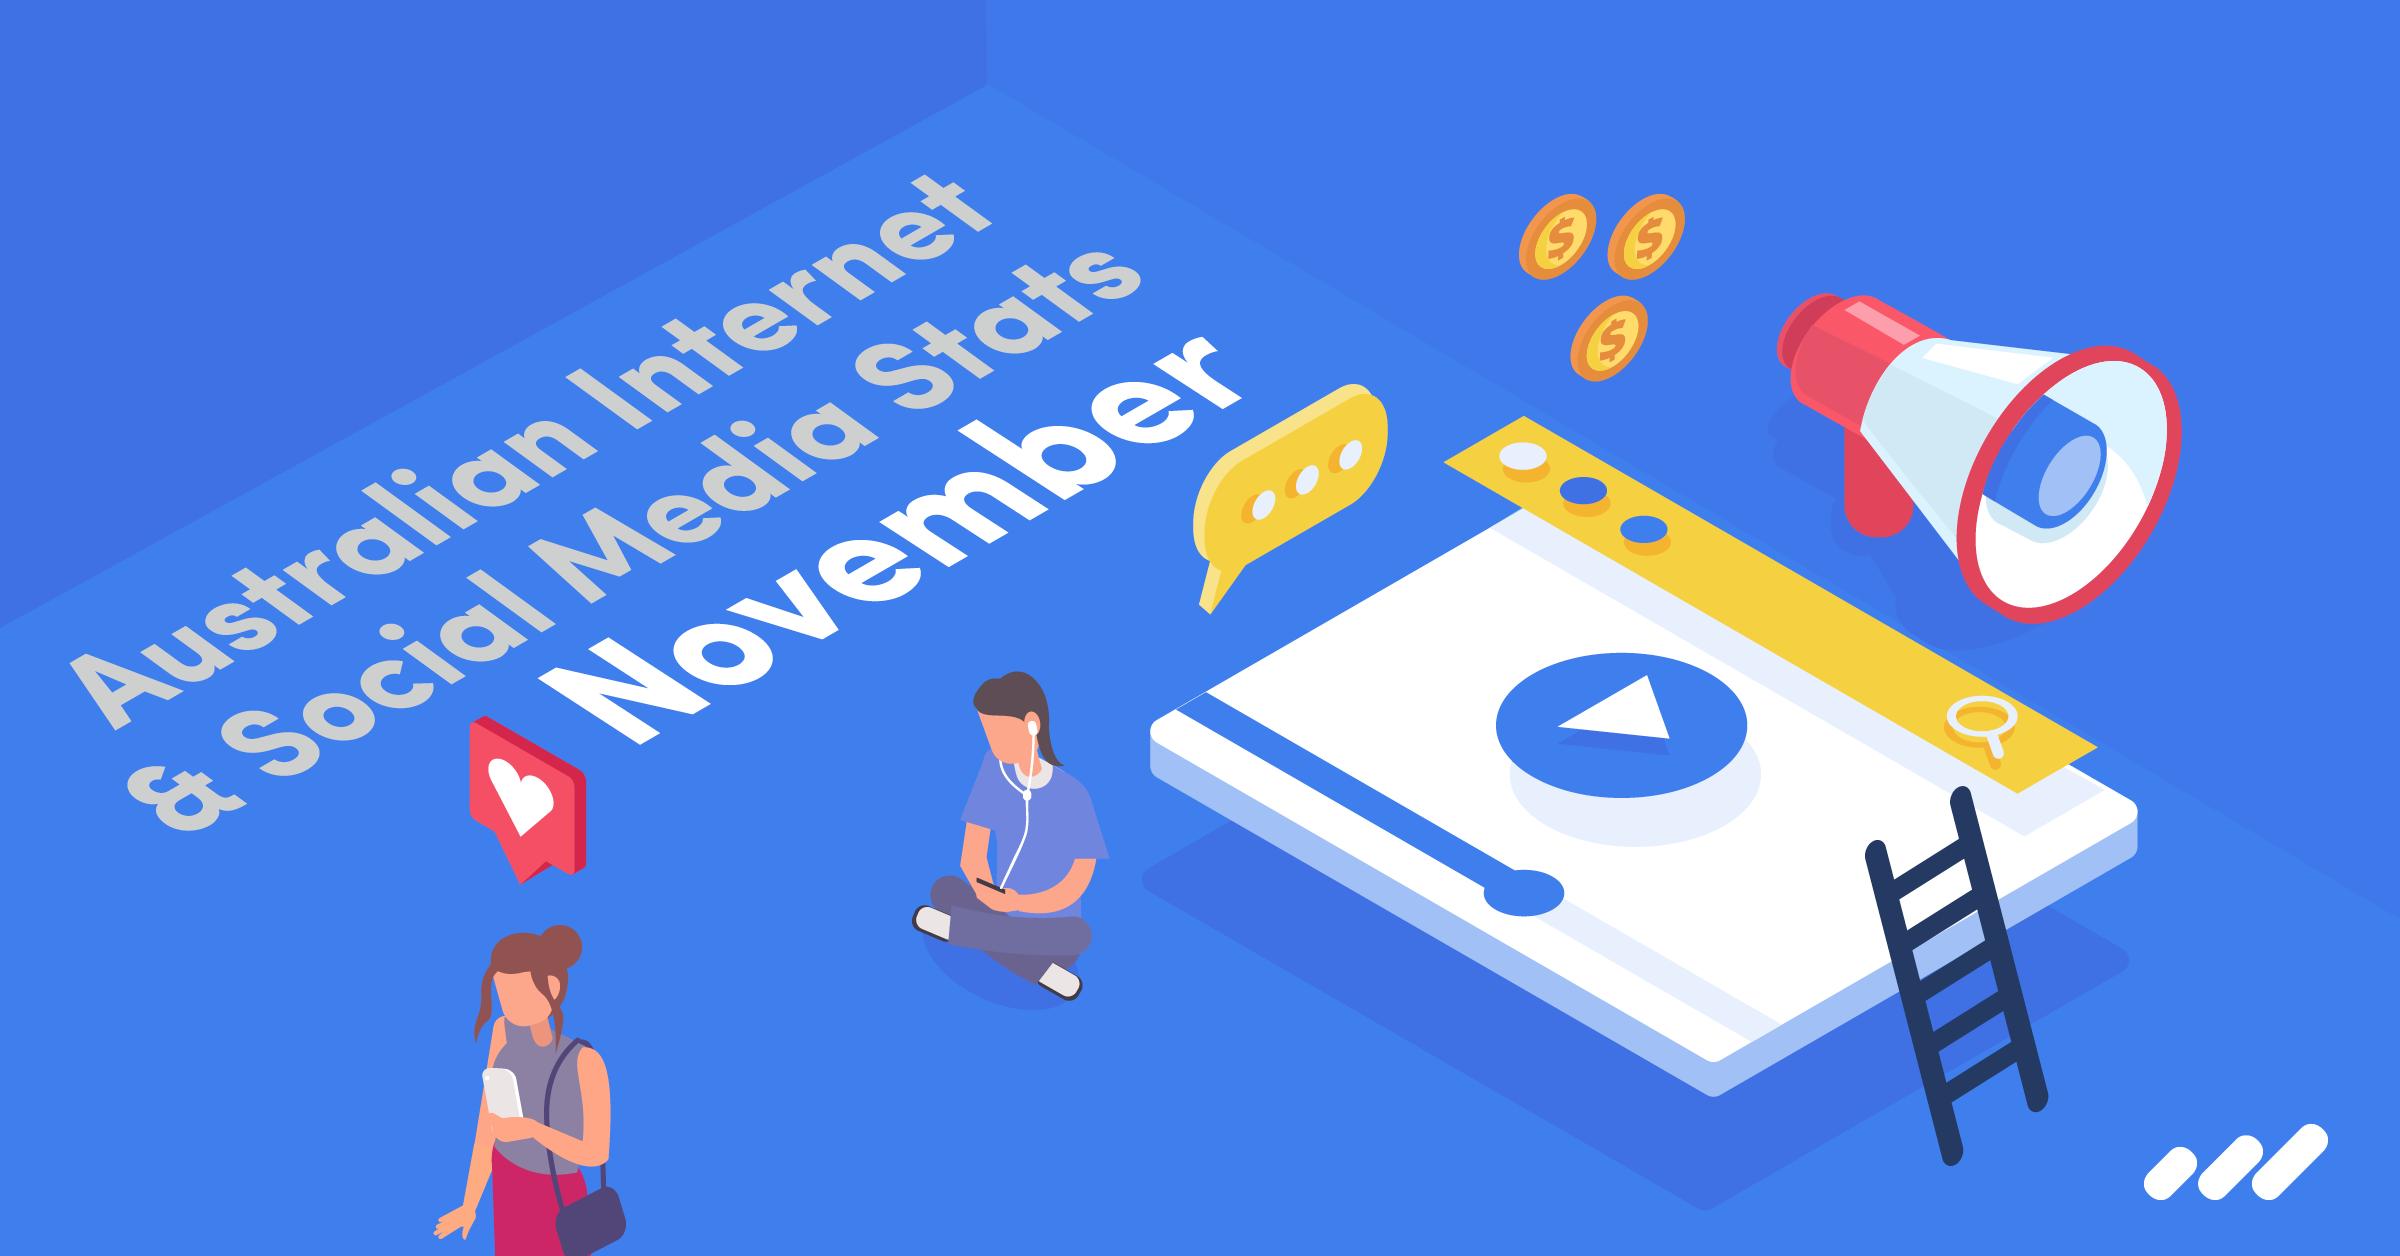 11-AustralianInternetSocialMediaStats-November